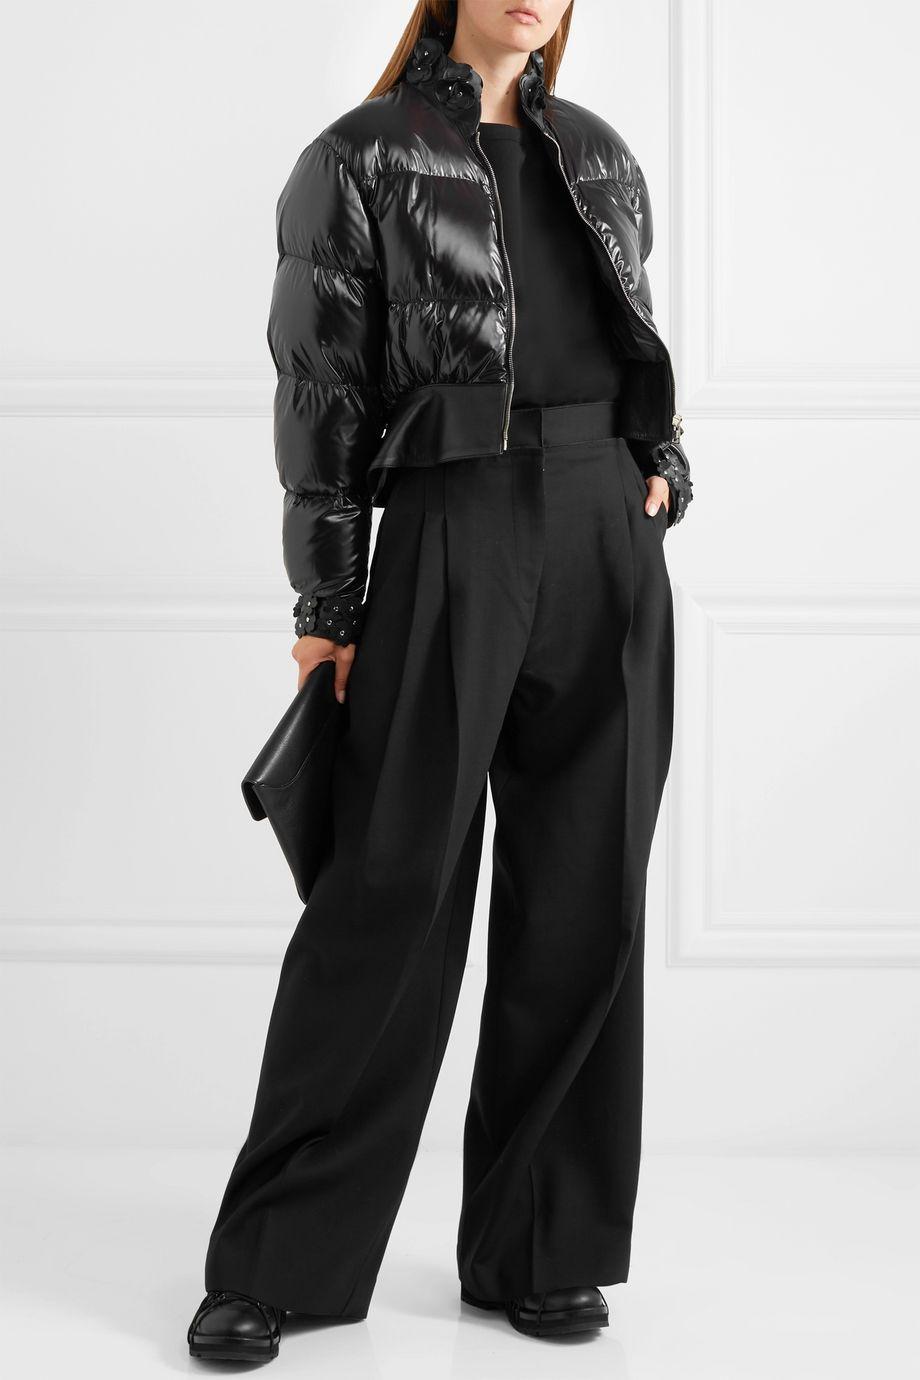 Moncler Genius + 6 Noir Kei Ninomiya cropped appliquéd quilted shell down jacket